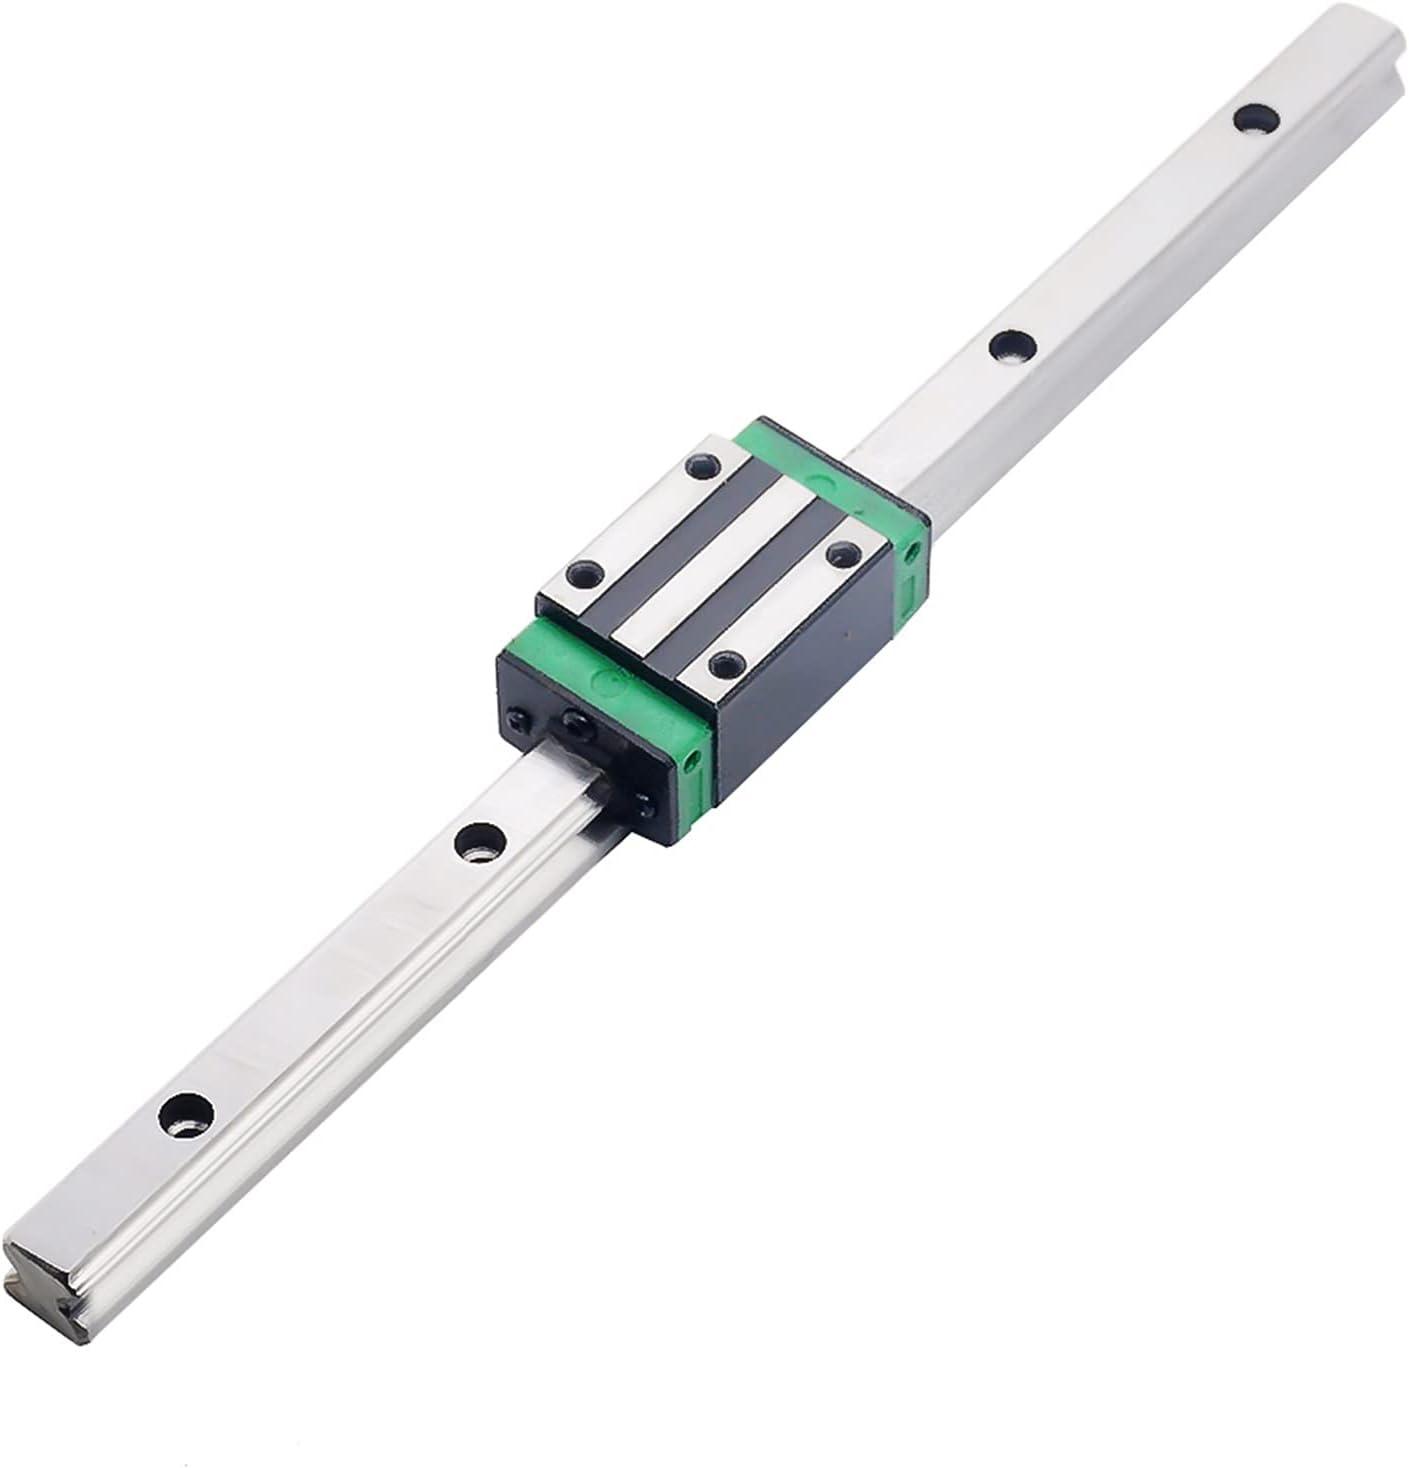 3D Print Parts CNC Router Linear 1pc Guide HGR20-L-300mm+1p Rail New sales Louisville-Jefferson County Mall